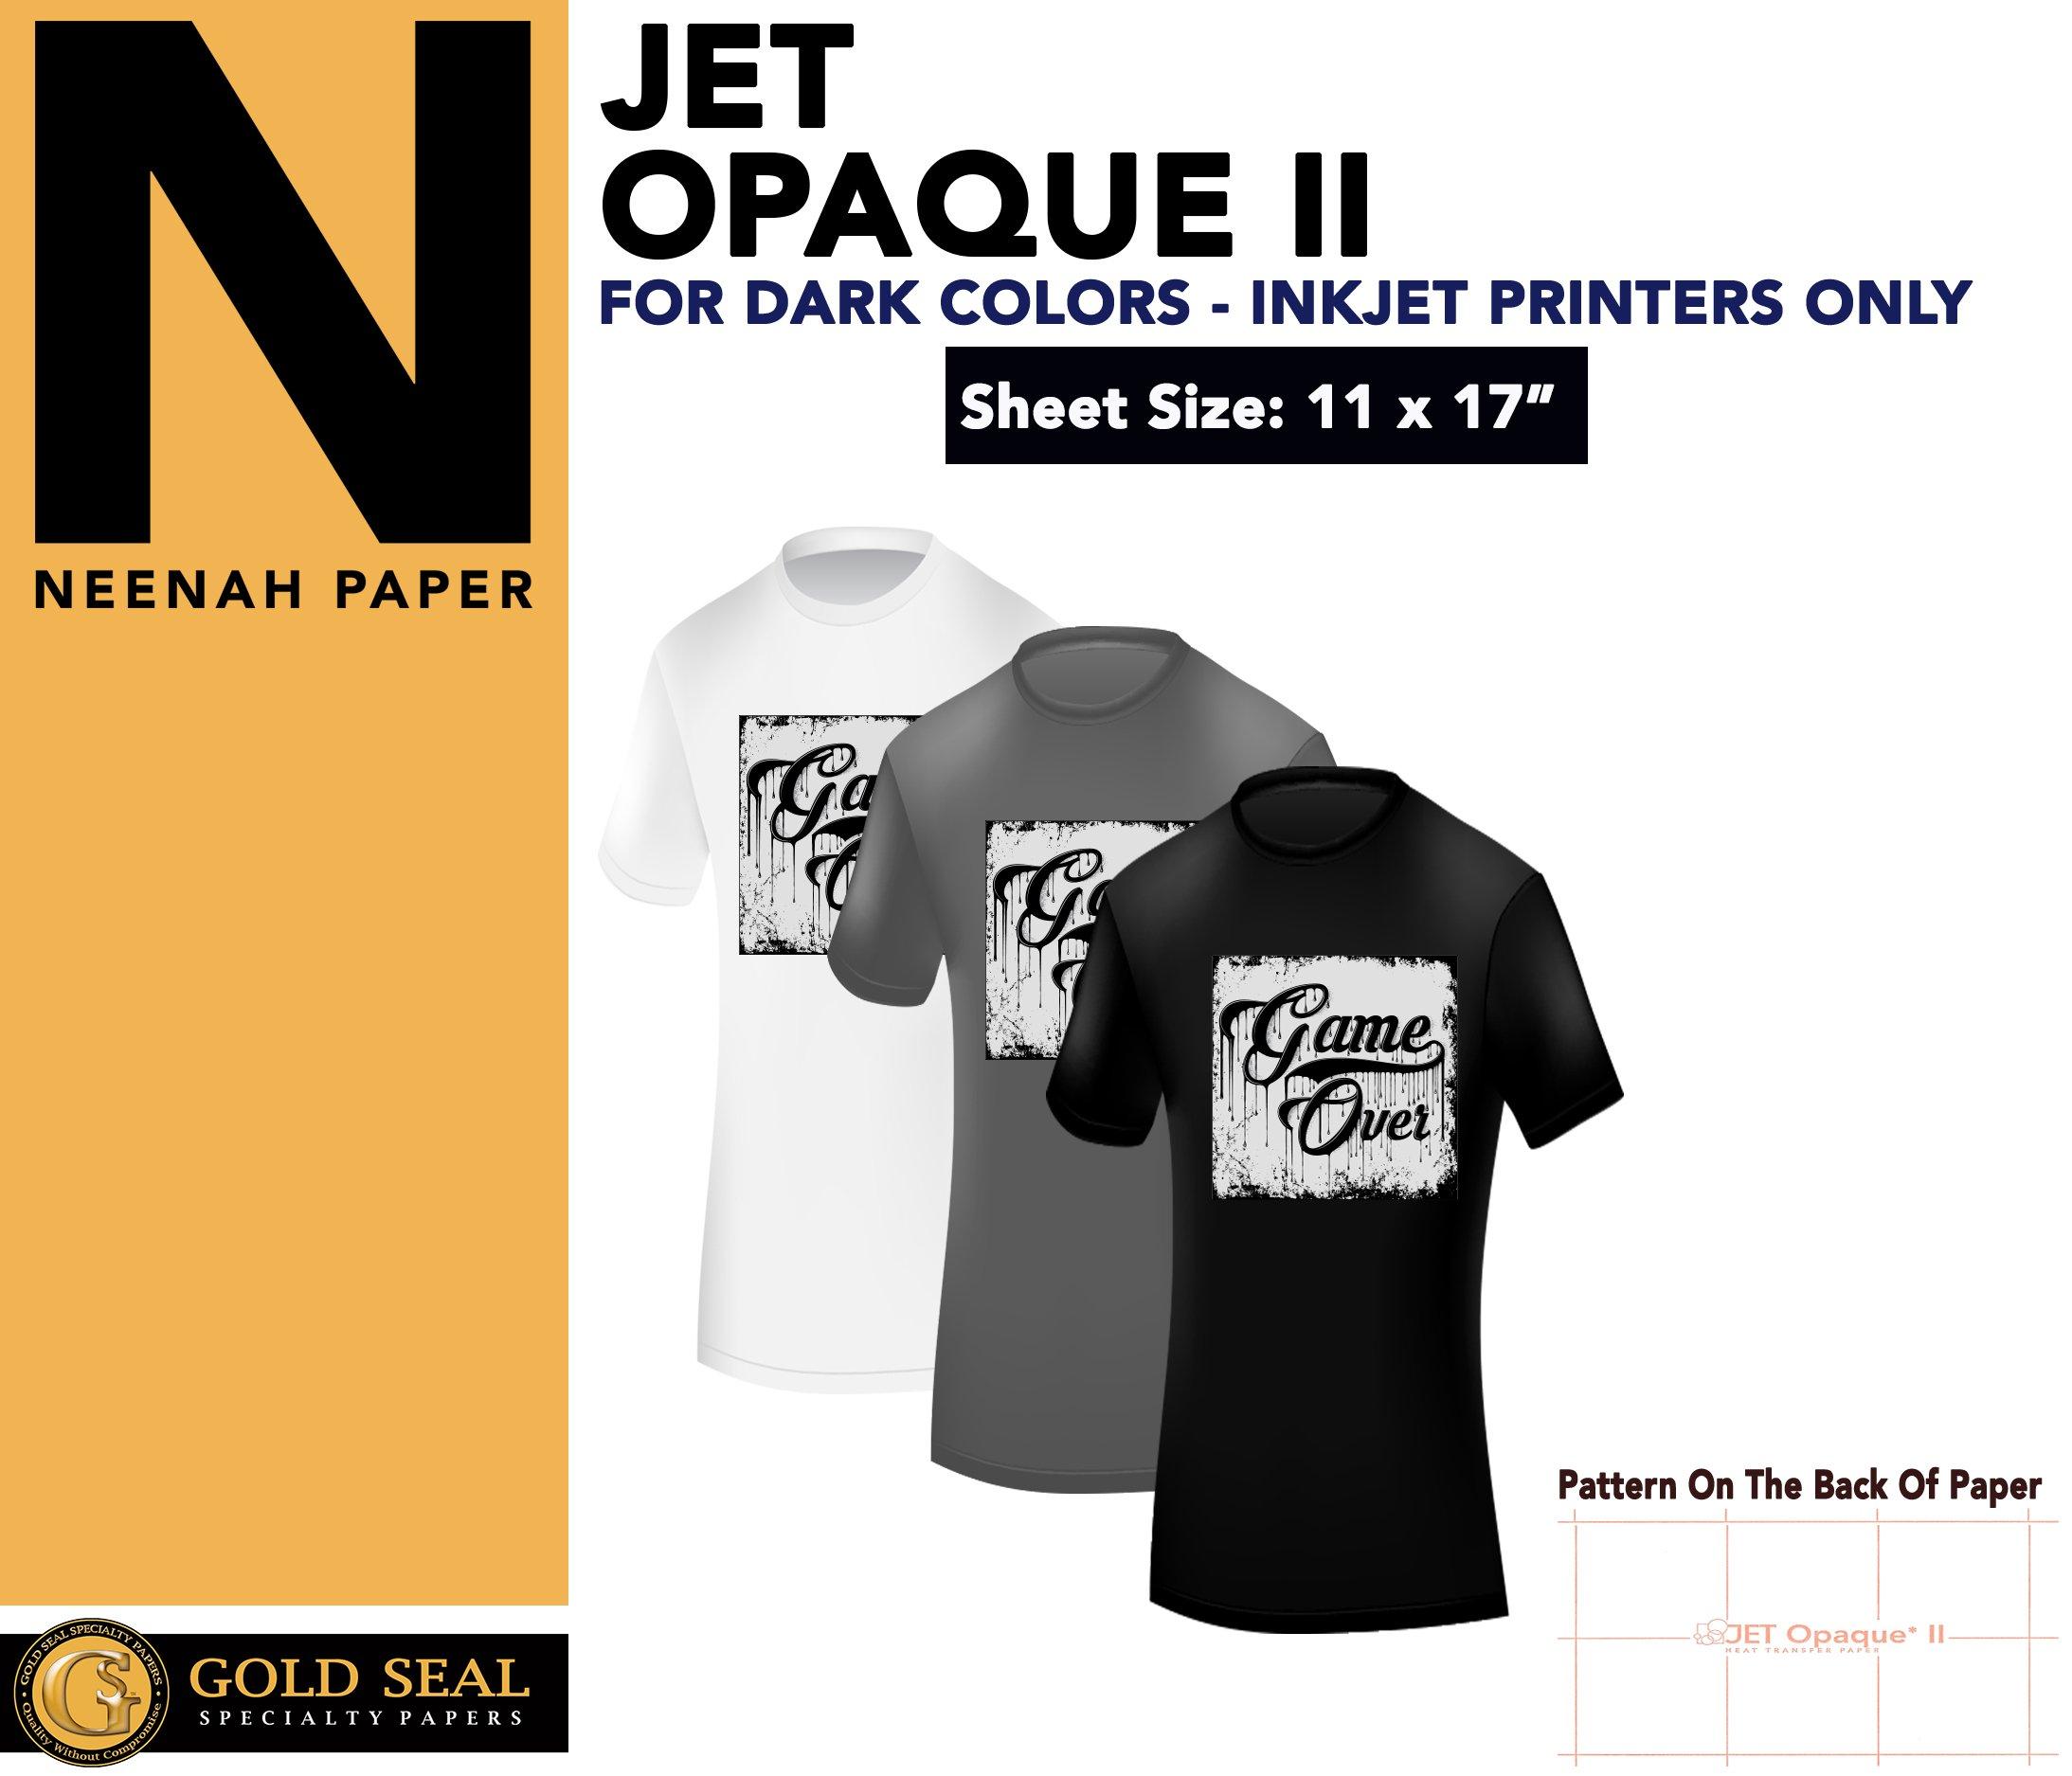 IRON ON HEAT TRANSFER PAPER JET OPAQUE II 11 x 17'' CUSTOM PACK 50 SHEETS